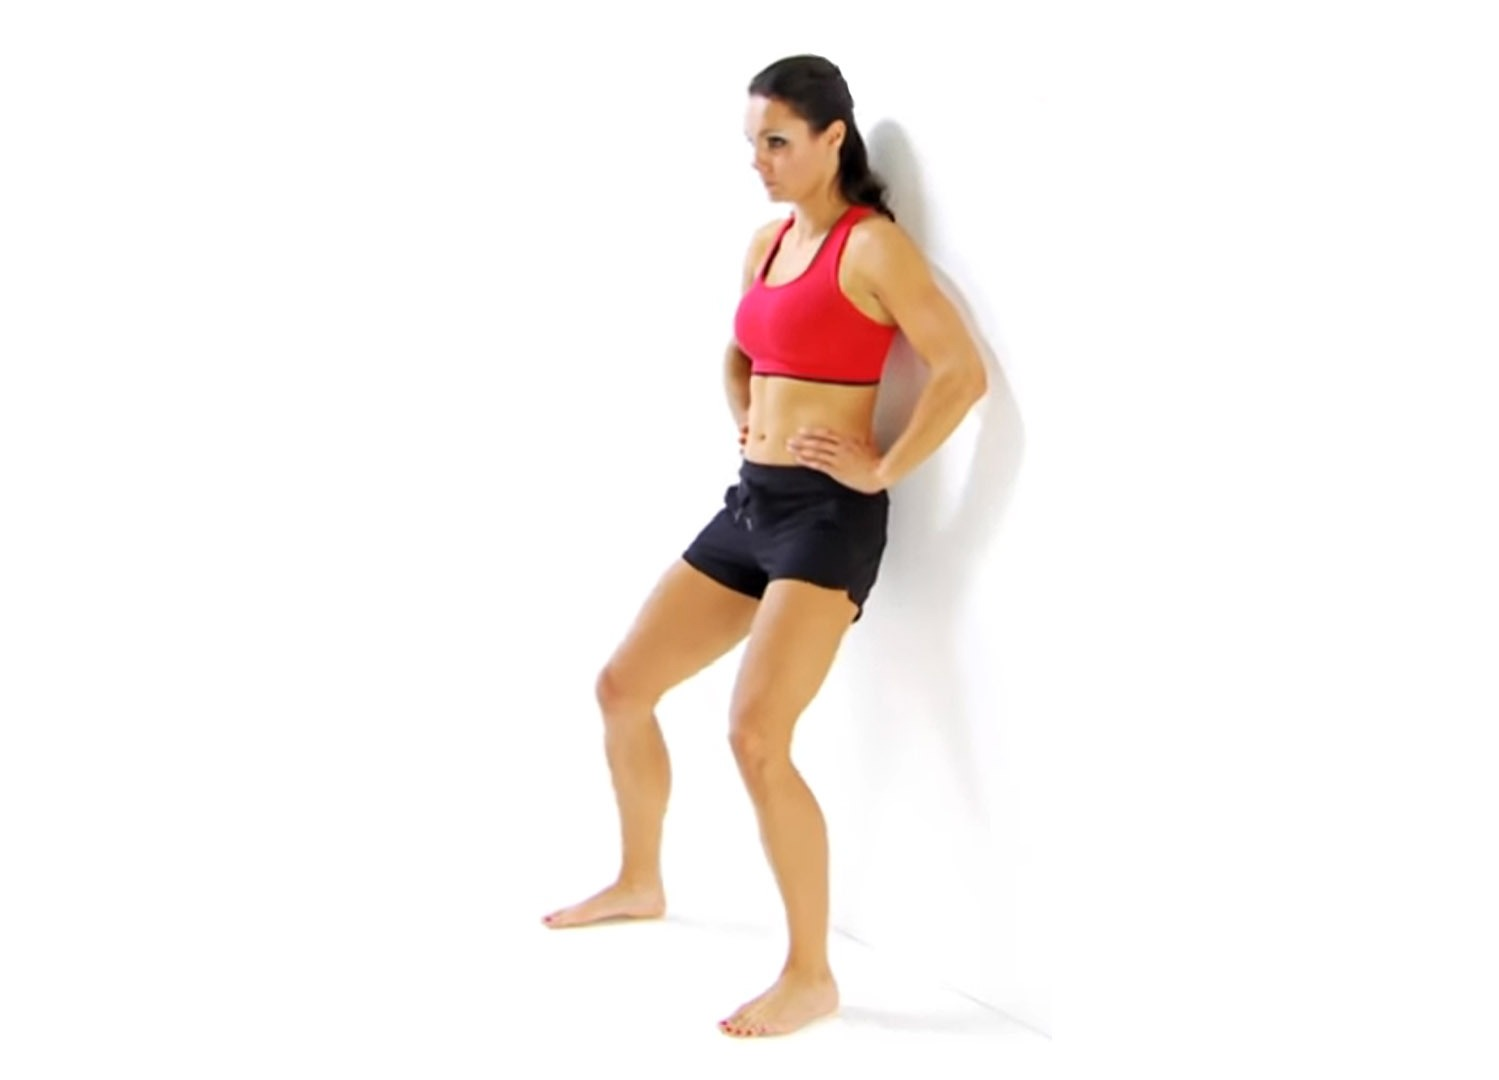 squat-2-1590244206.jpg